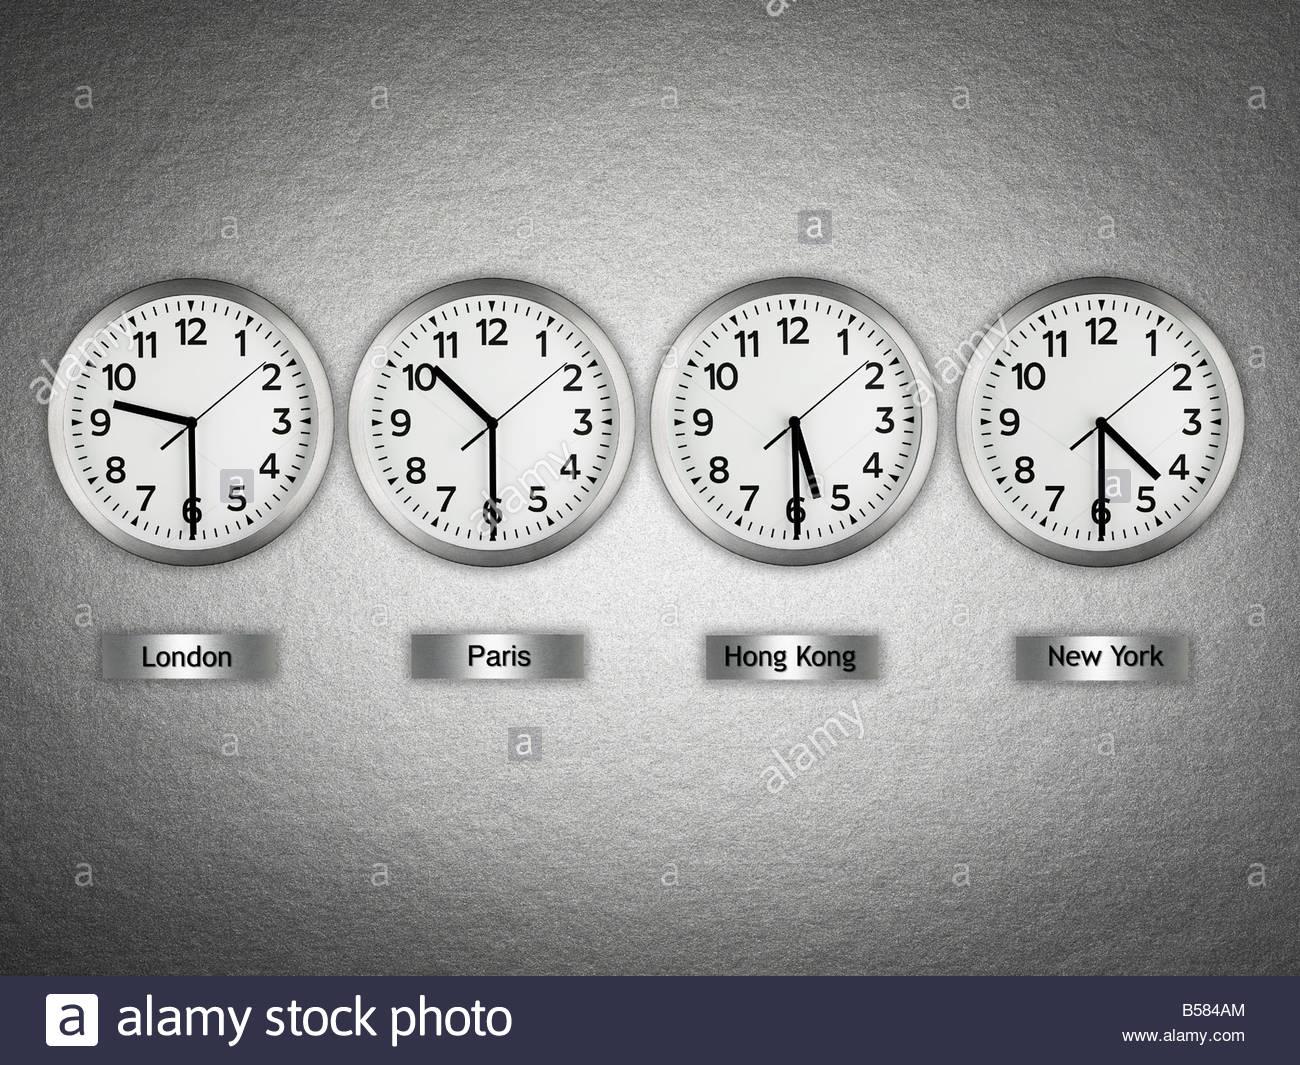 International wall clocks - Stock Image